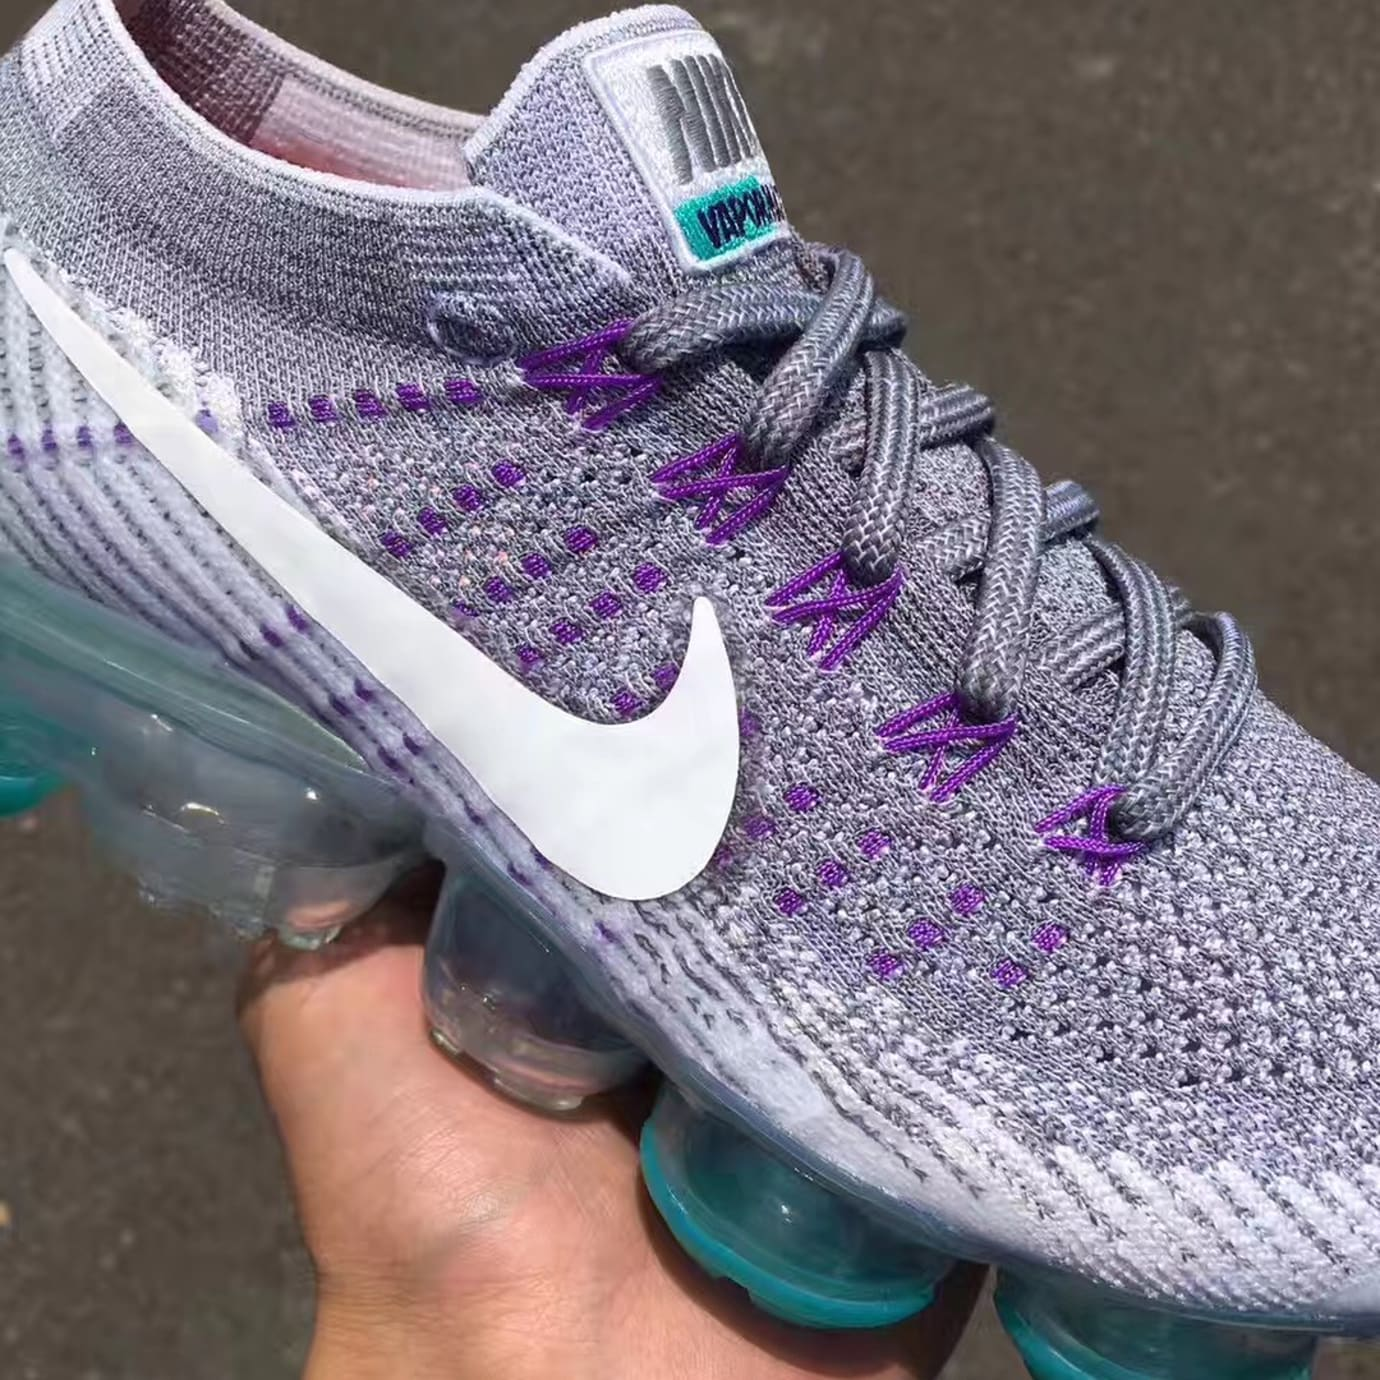 5b475cf1bb5 Nike Air VaporMax Grape Release Date Swoosh